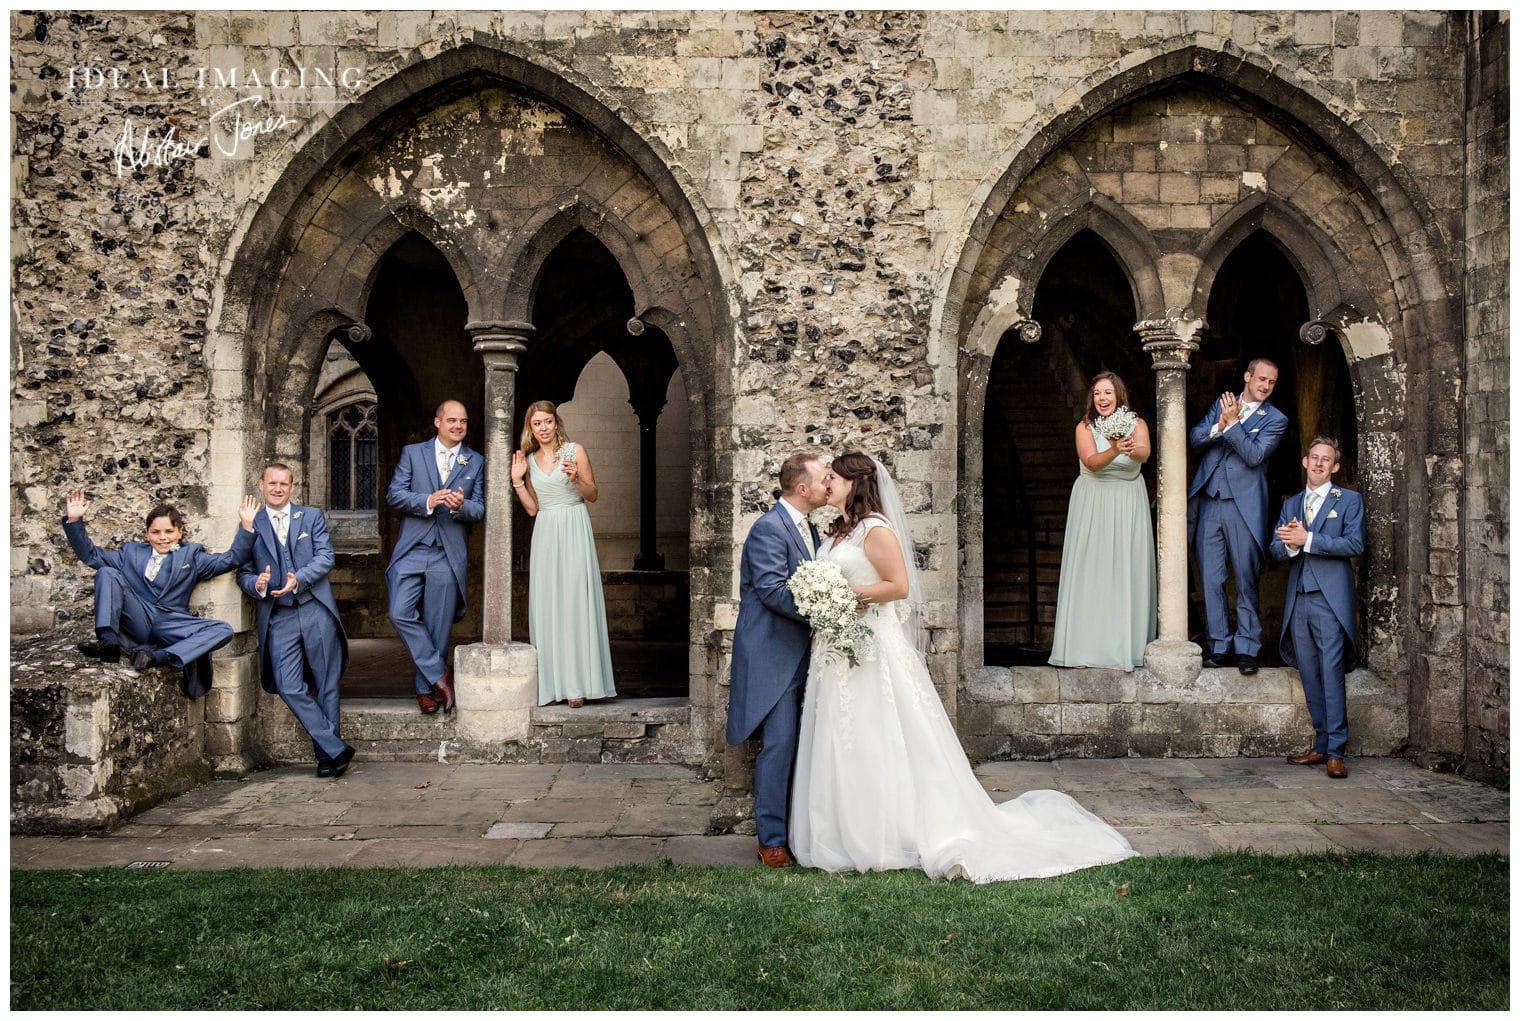 canterbury_cathedral_wedding-097